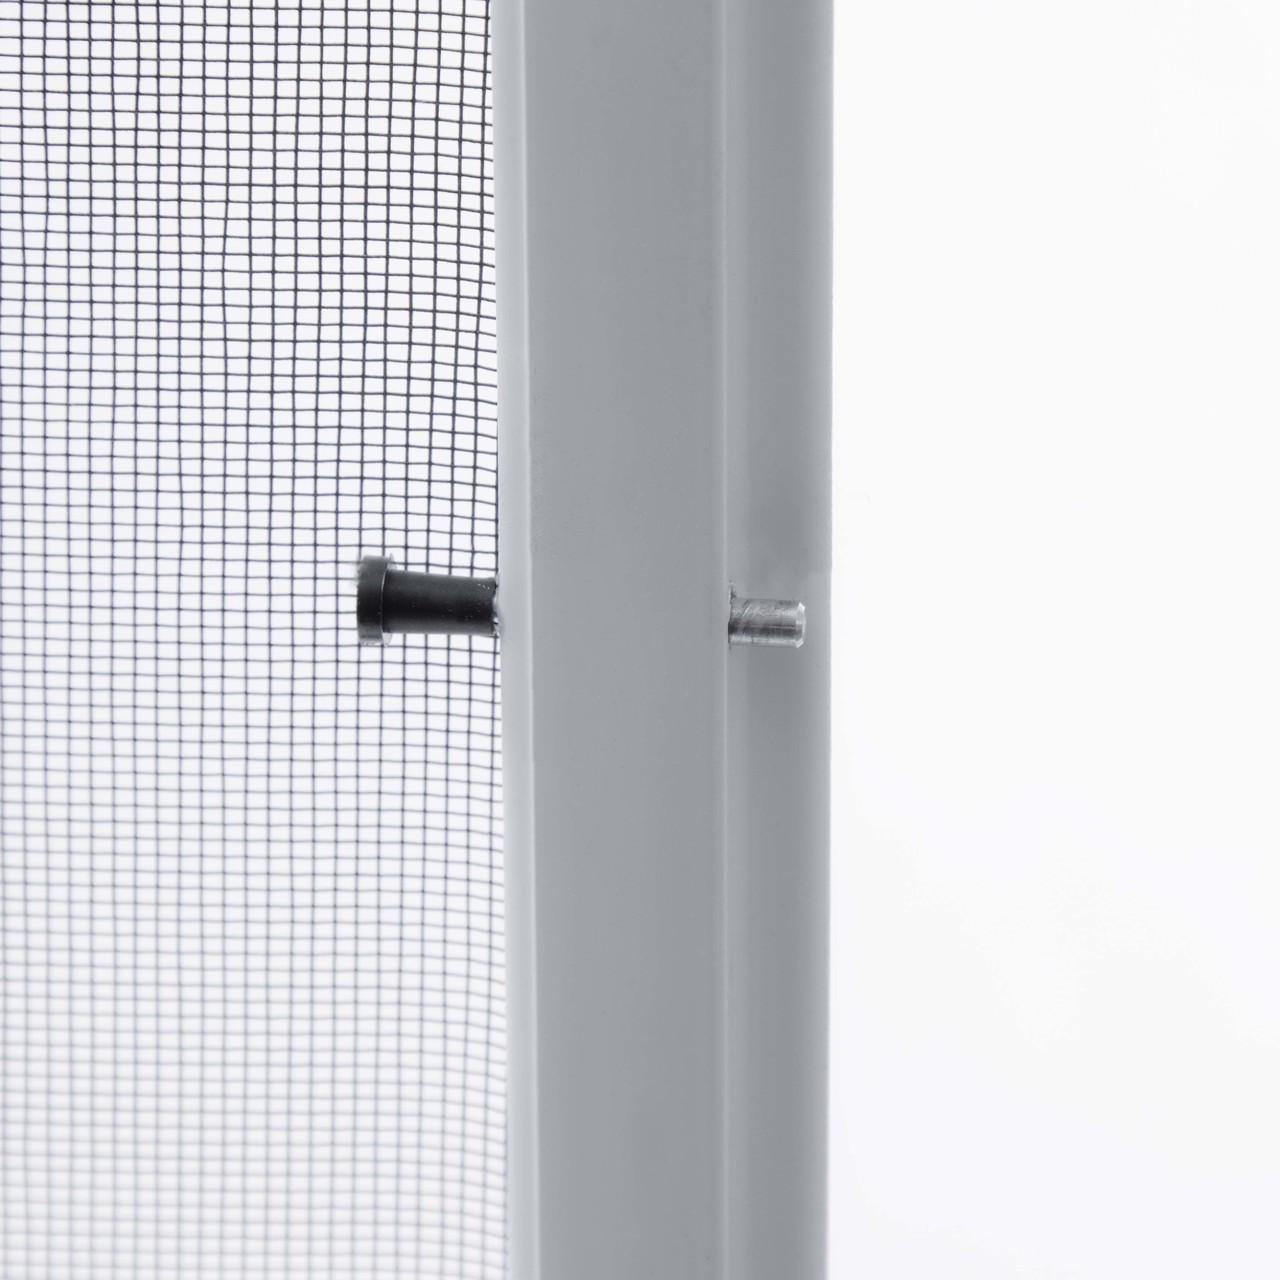 Lip Frame Window Screens - Measure Includes Lip